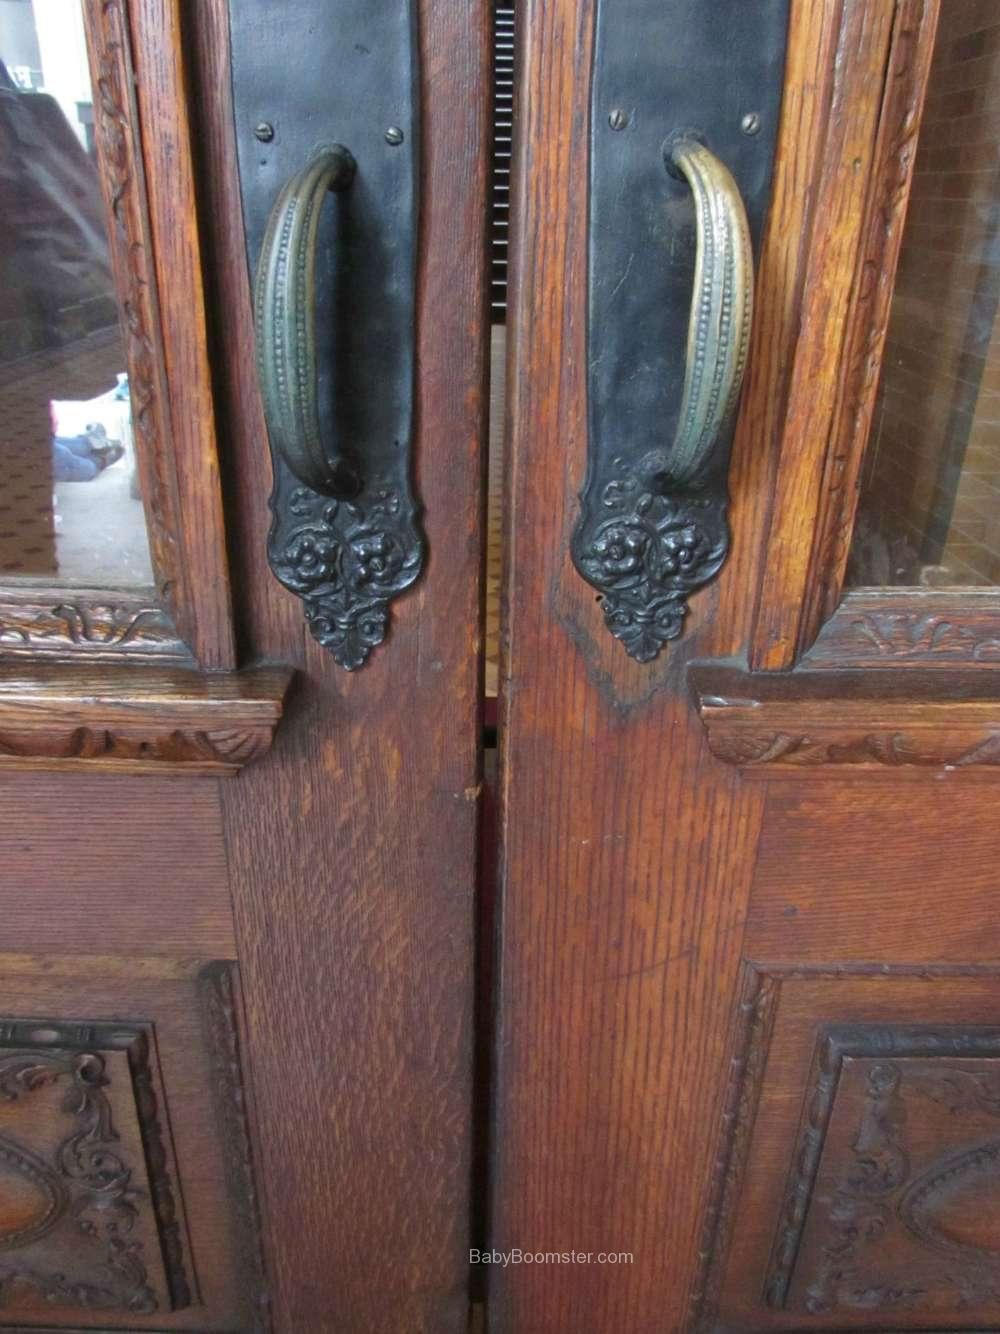 Los Angeles, California | Bradbury Building Doors | Downtown Los Angeles